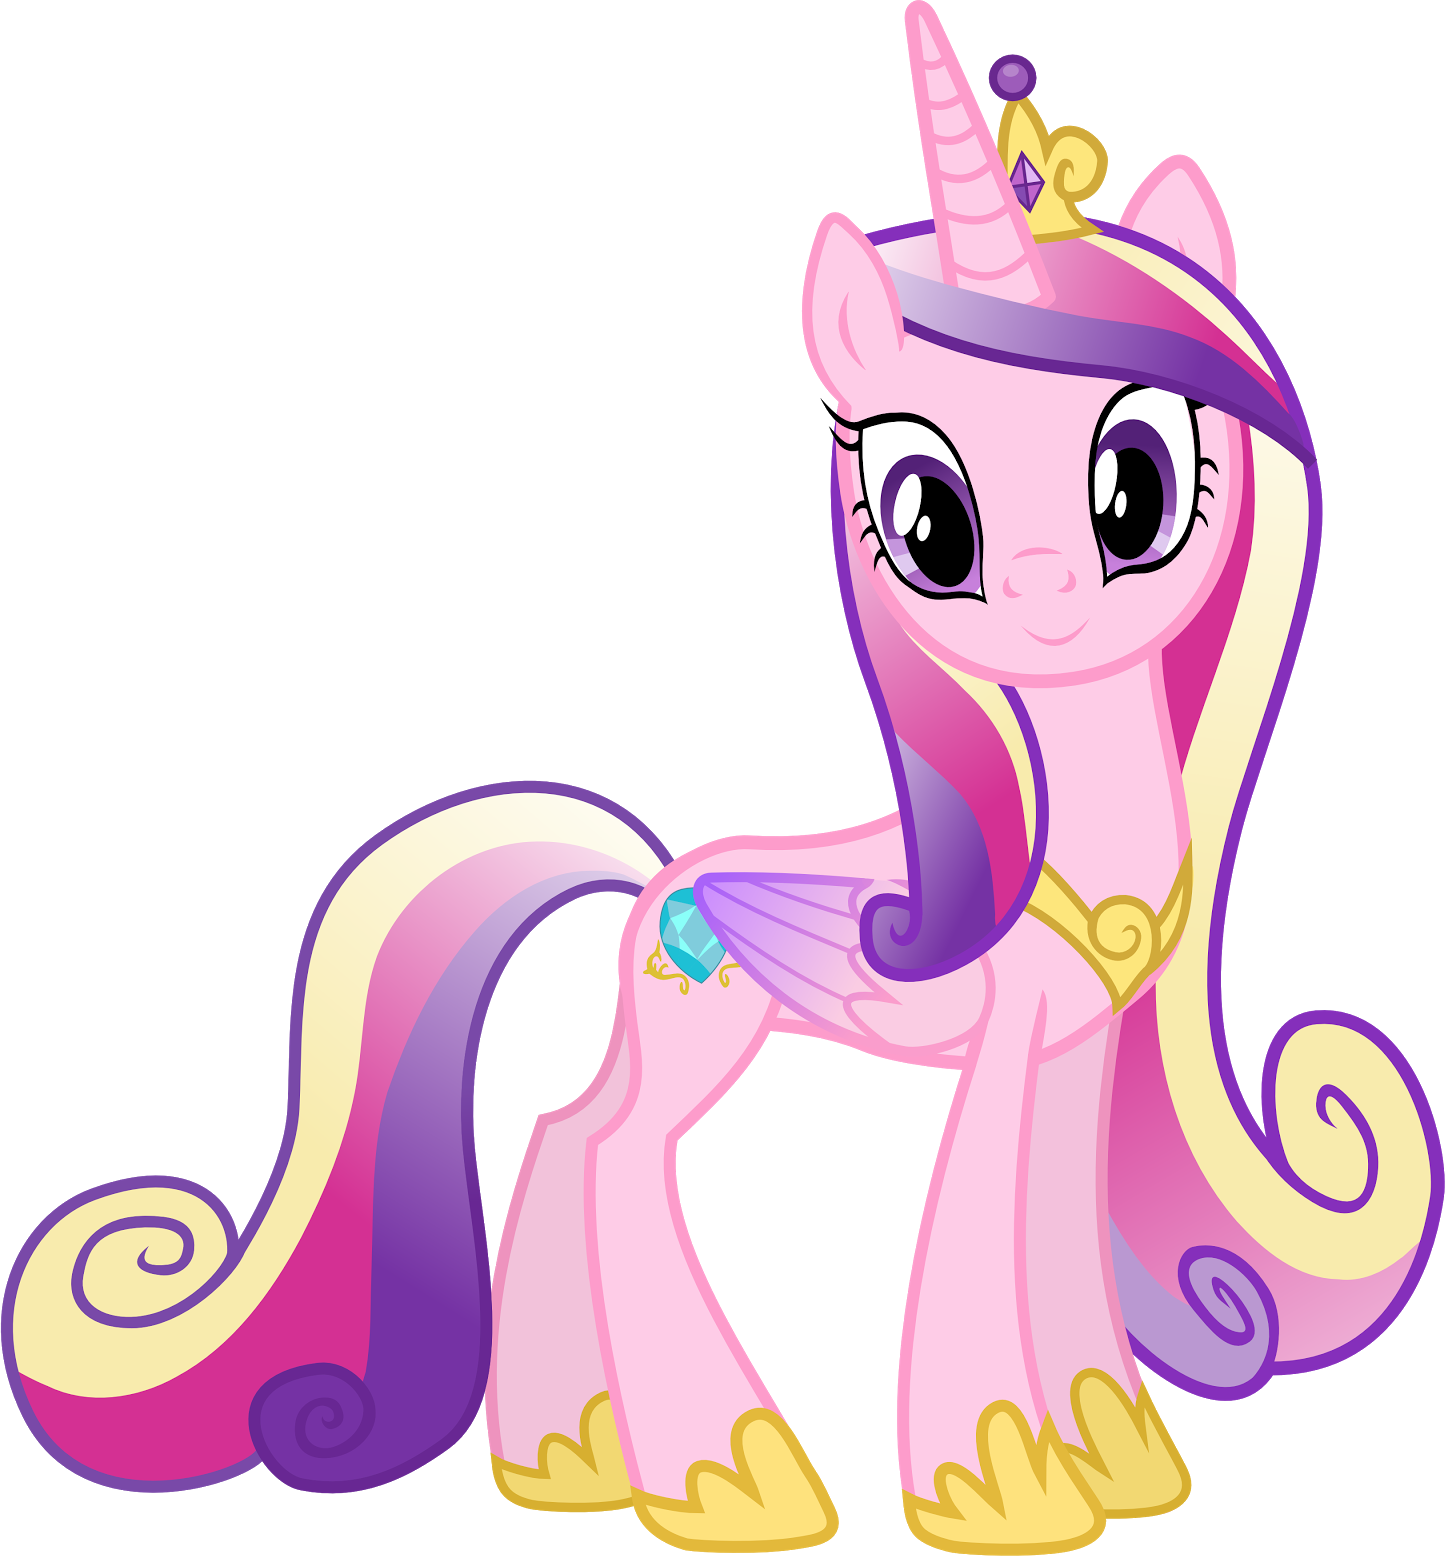 Princesse Cadance Coloriage.Fresh Coloriage De My Little Pony Princesse Cadance Inspirant